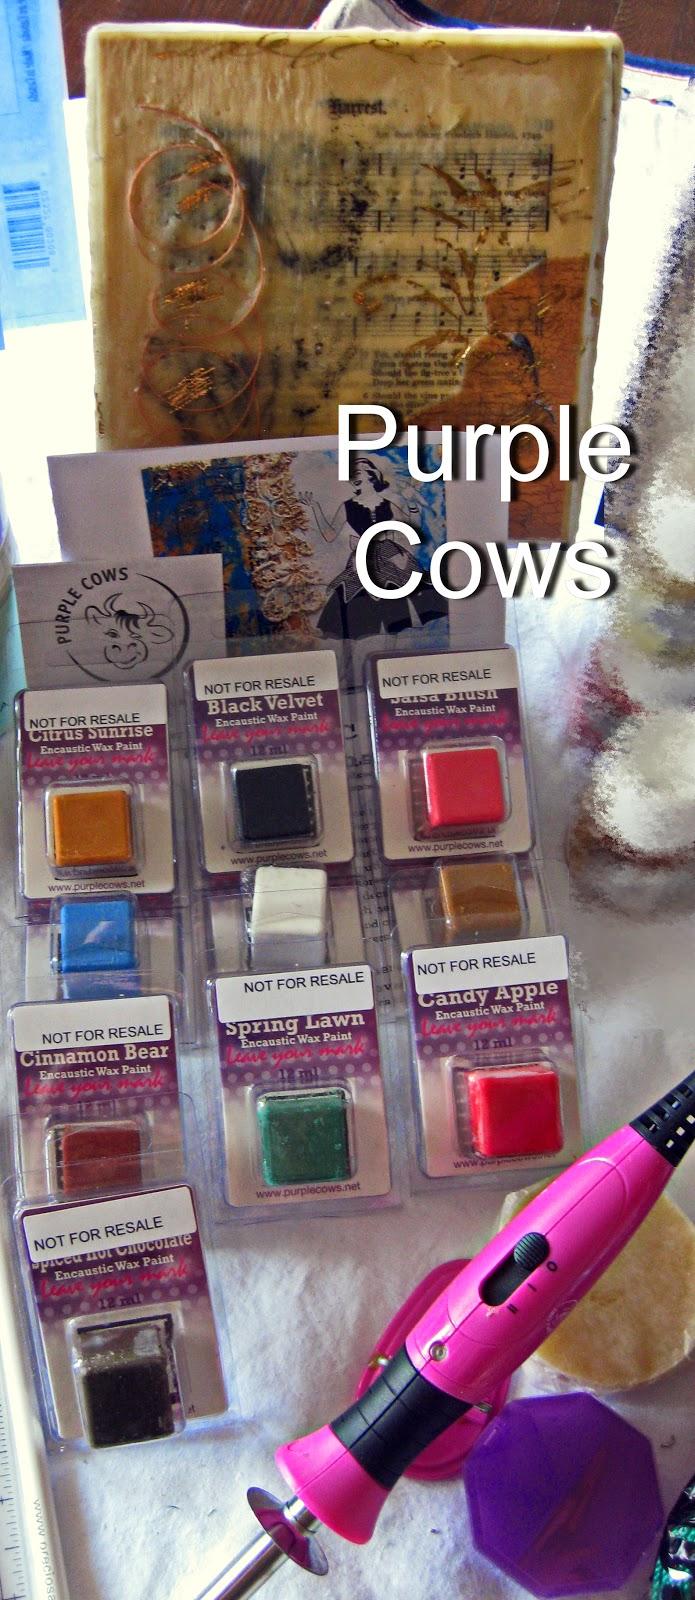 Purple Cows wax and encaustic